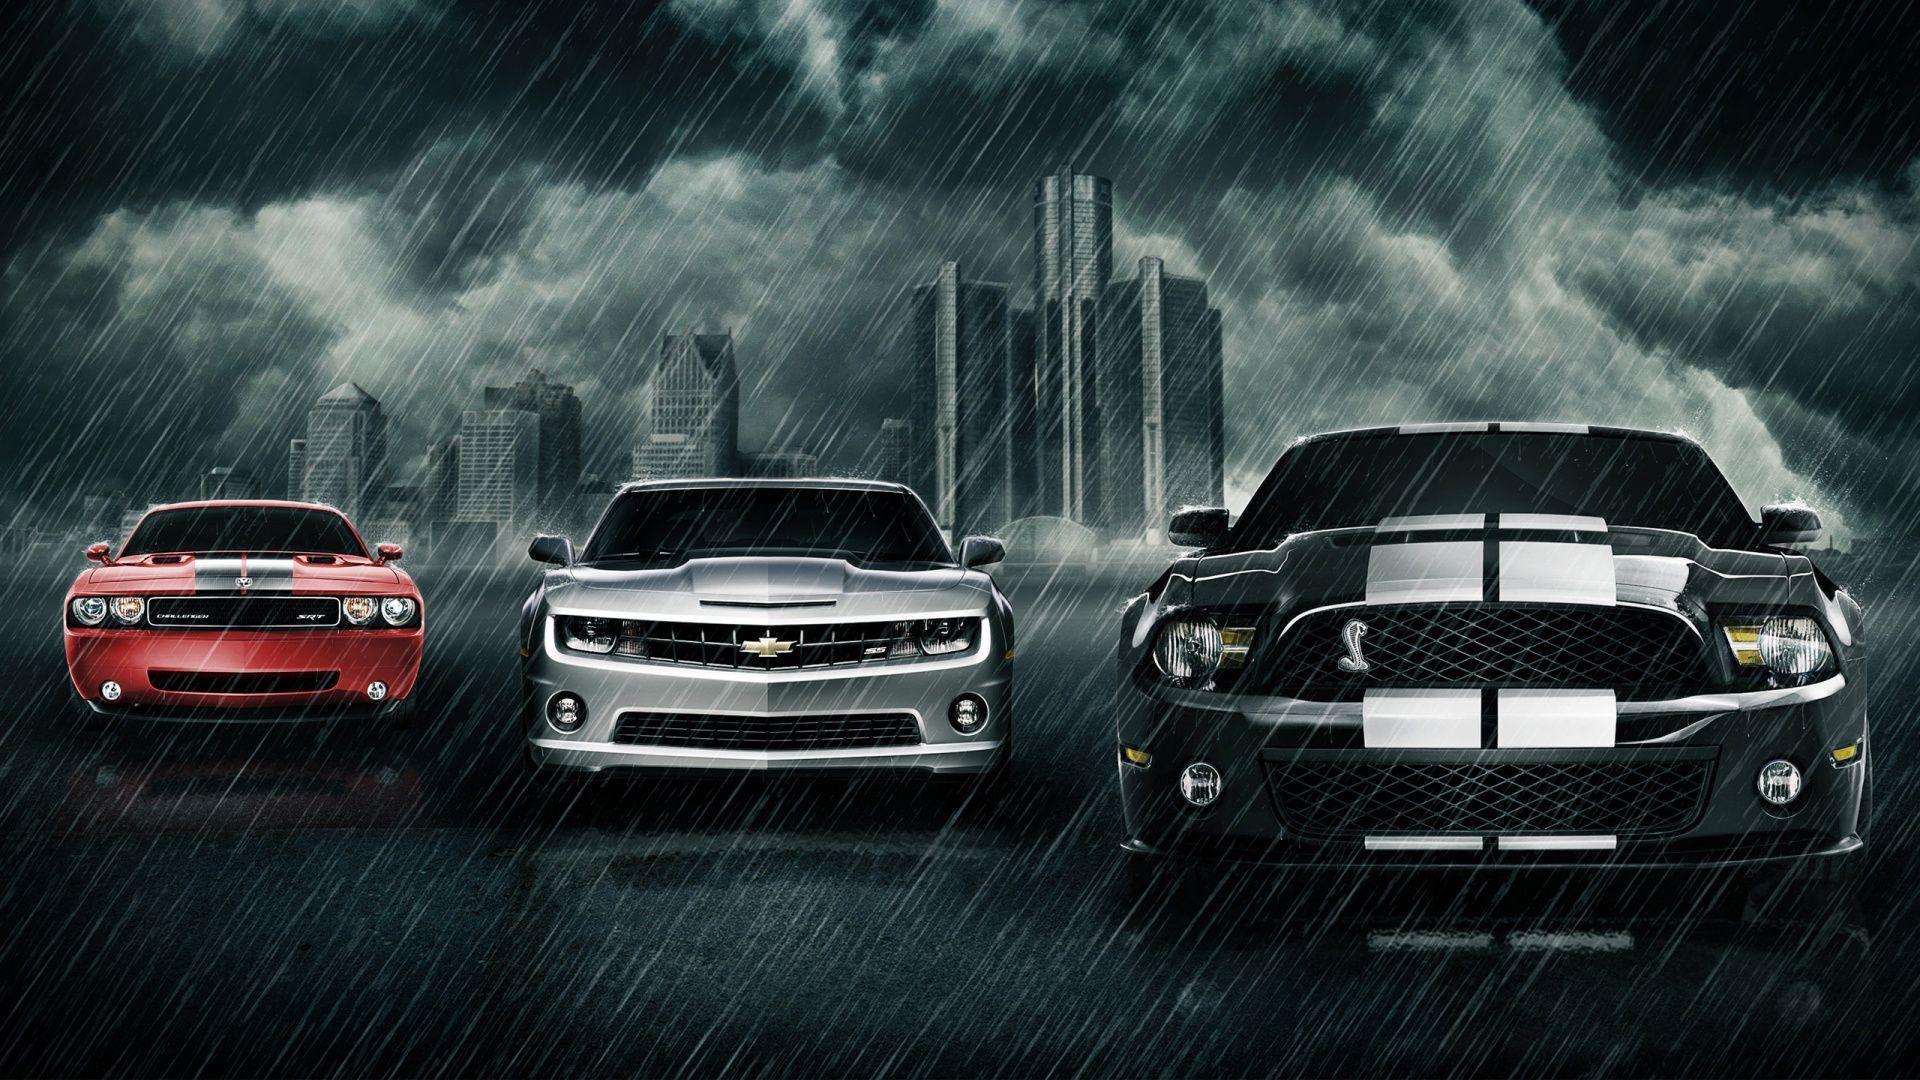 Sports Cars Hd Desktop Wallpapers Top Free Sports Cars Hd Desktop Backgrounds Wallpaperaccess